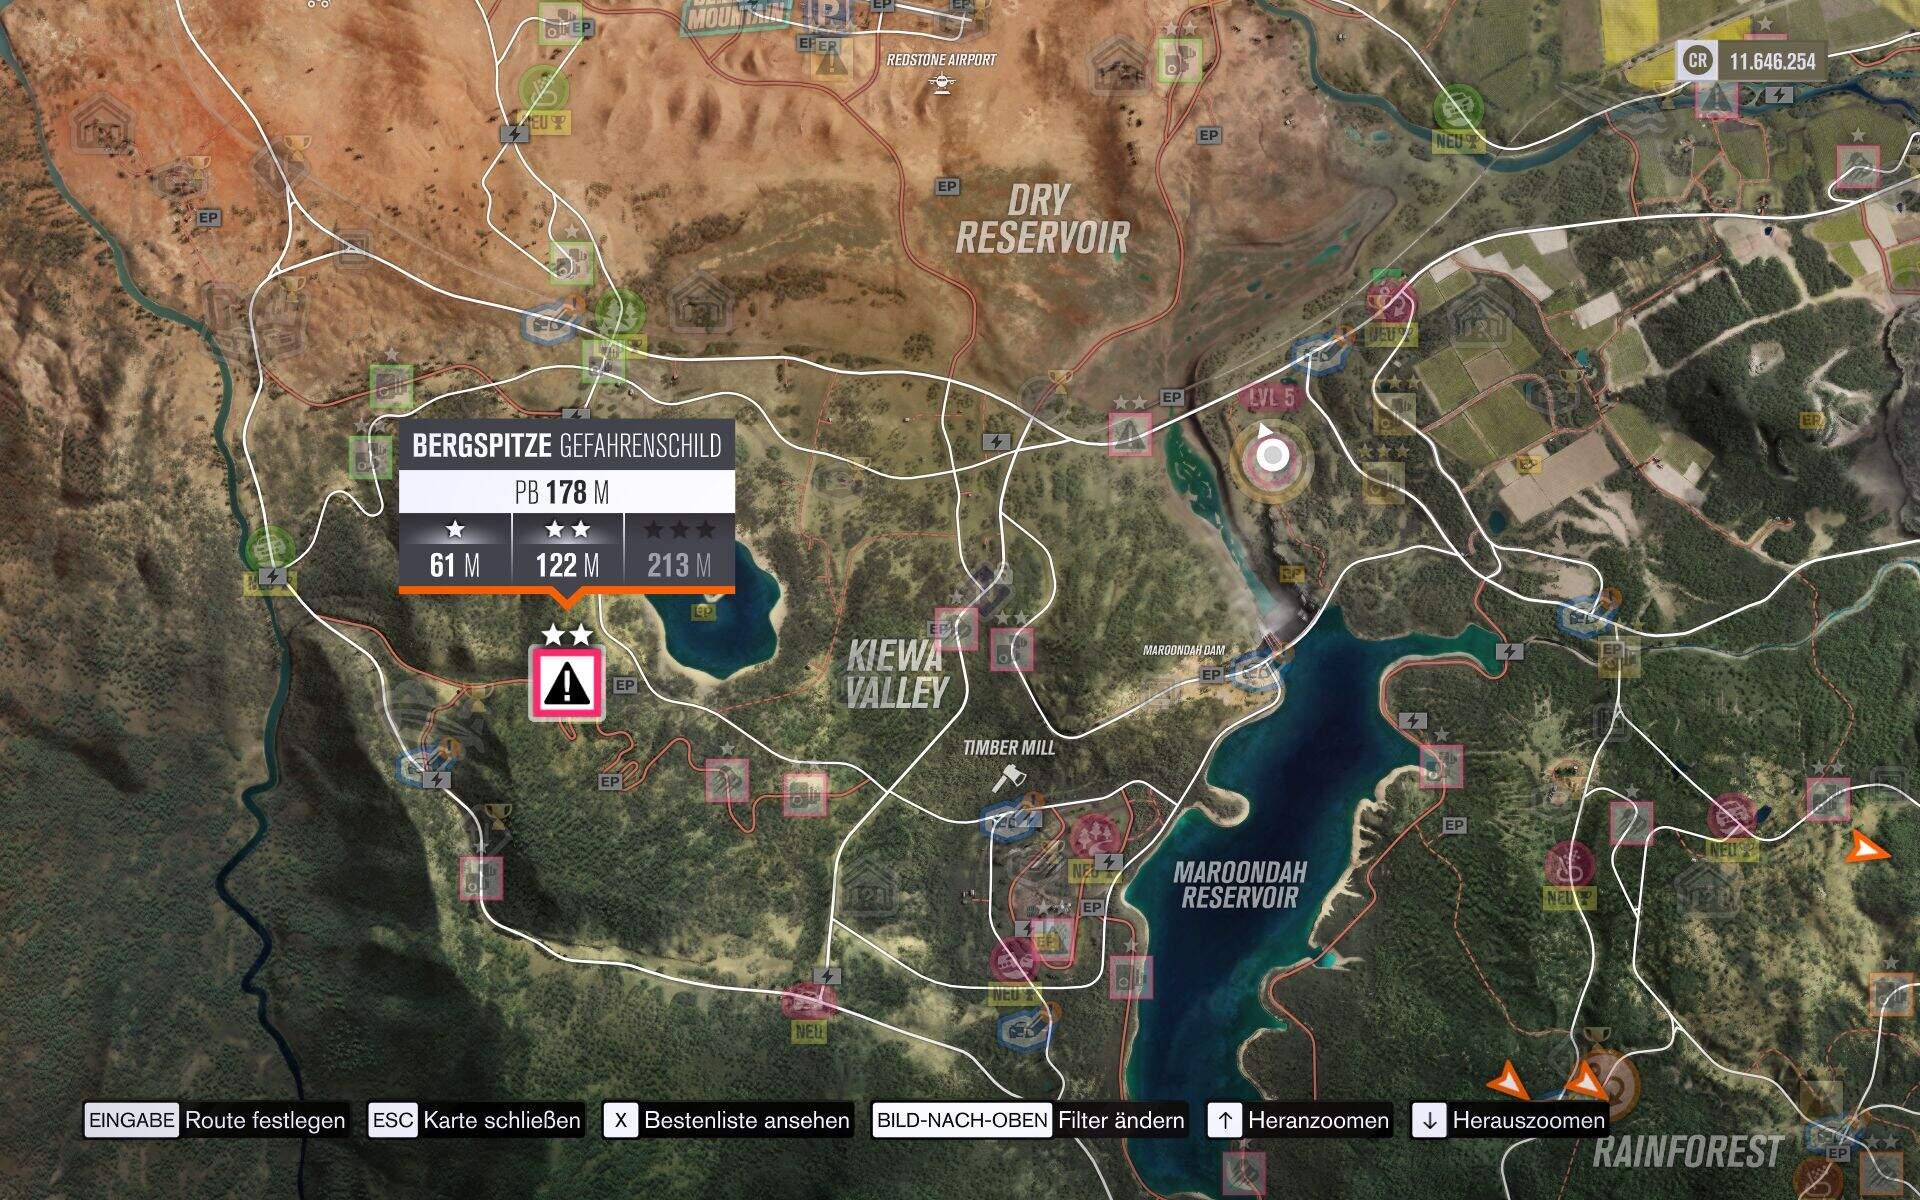 Forza Horizon 3 Bergspitze Gefahrenschild